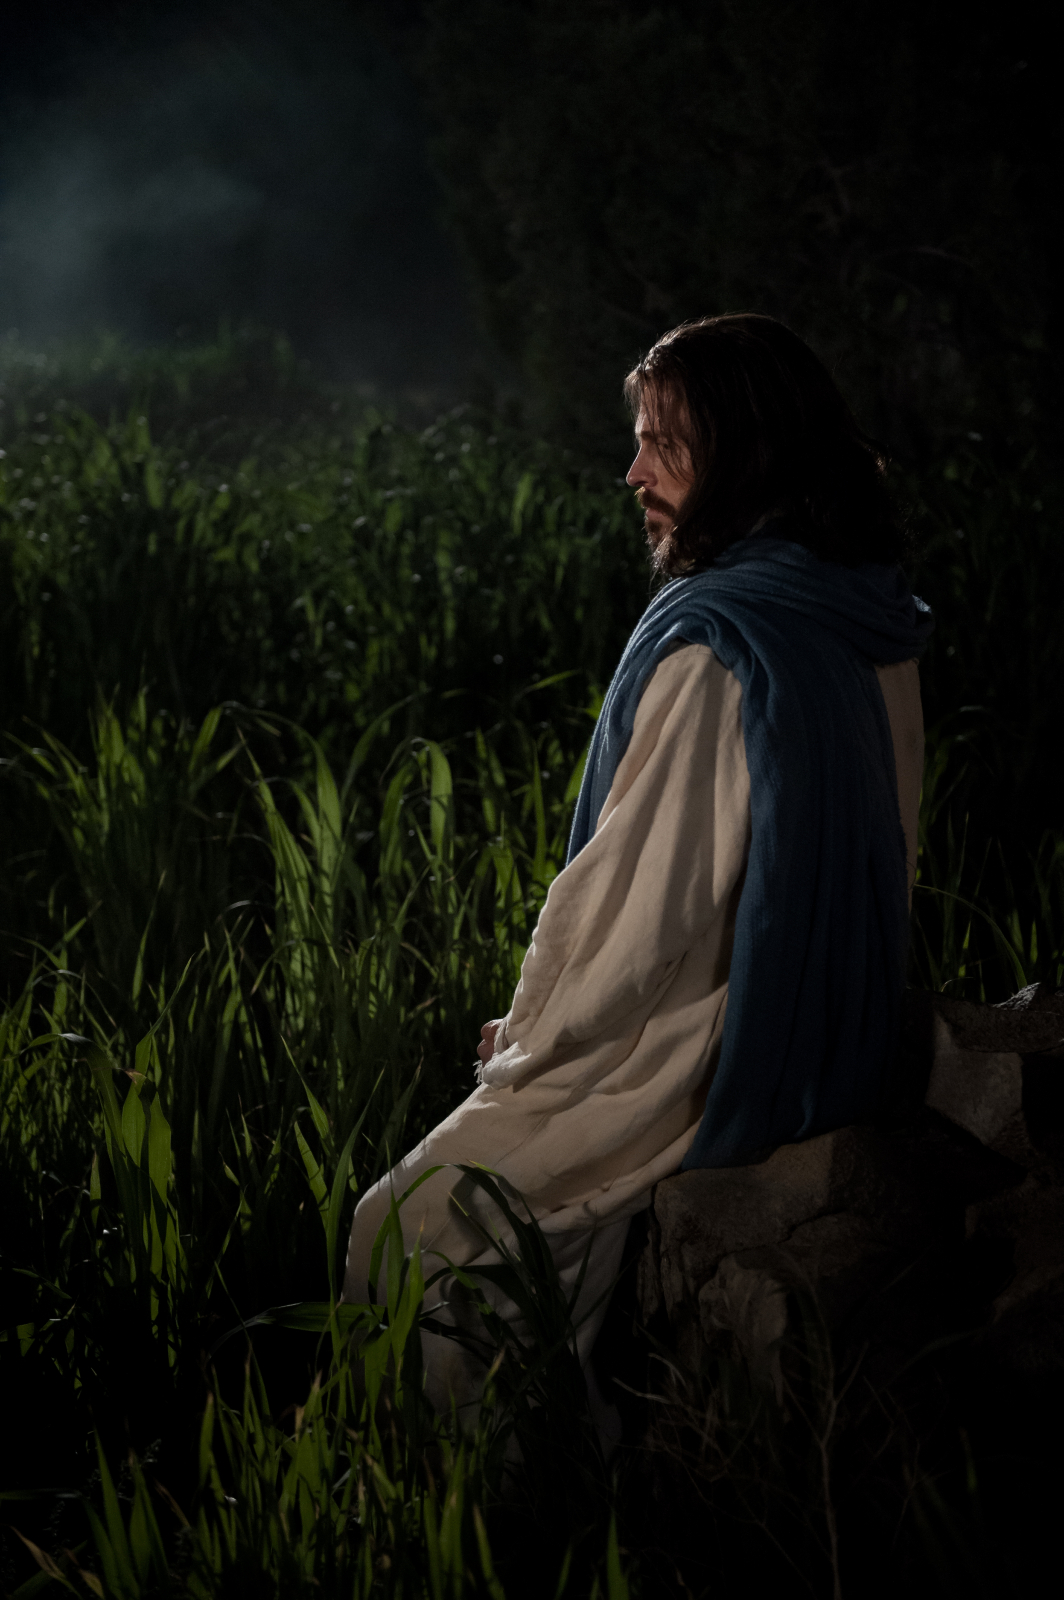 christ in the garden of gethsemane. Christ In The Garden Of Gethsemane 0